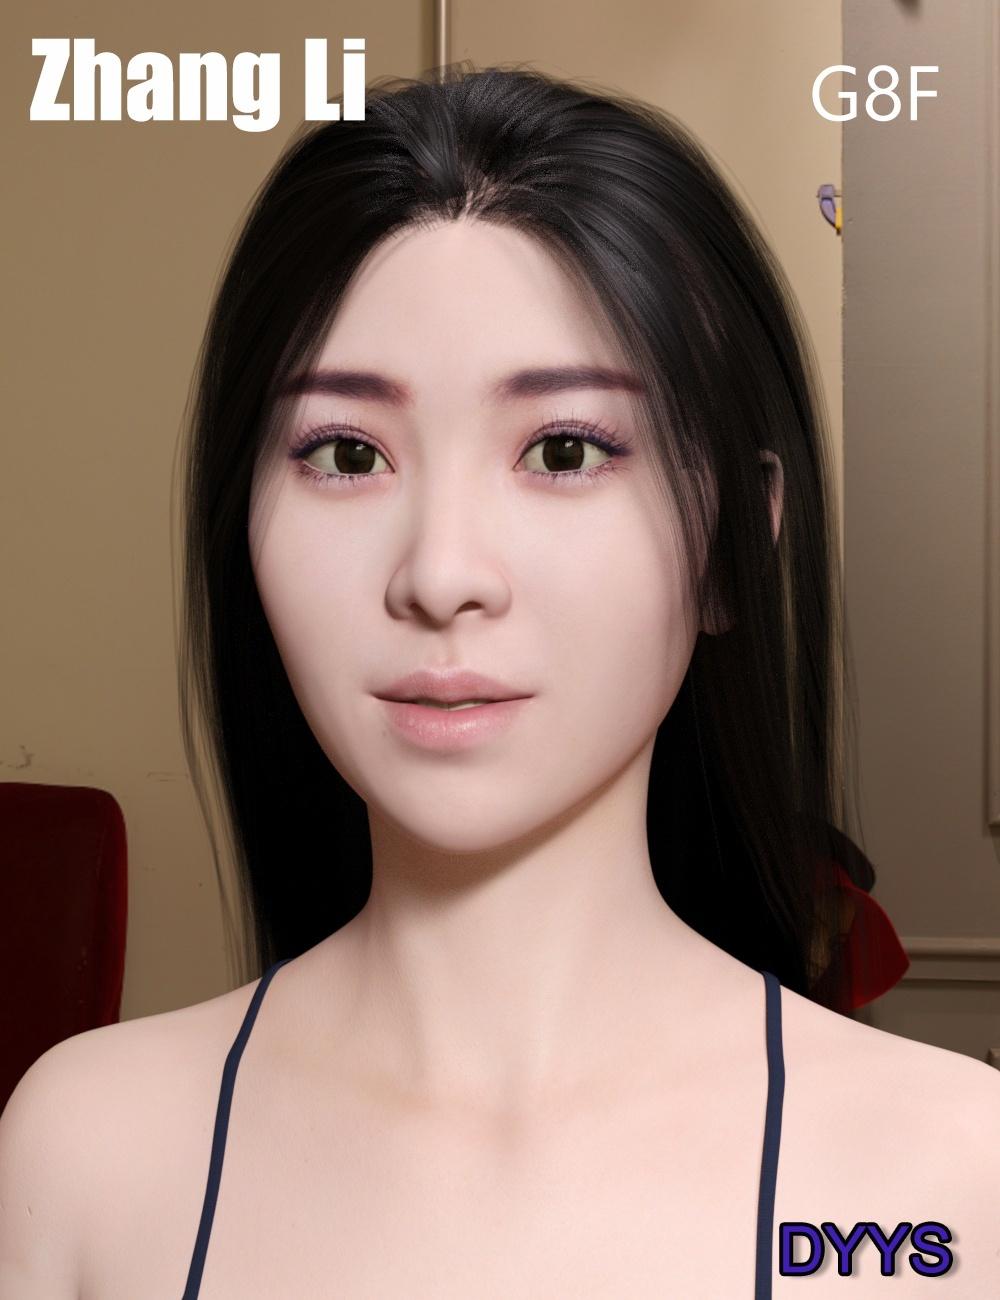 Zhang Li For G8F